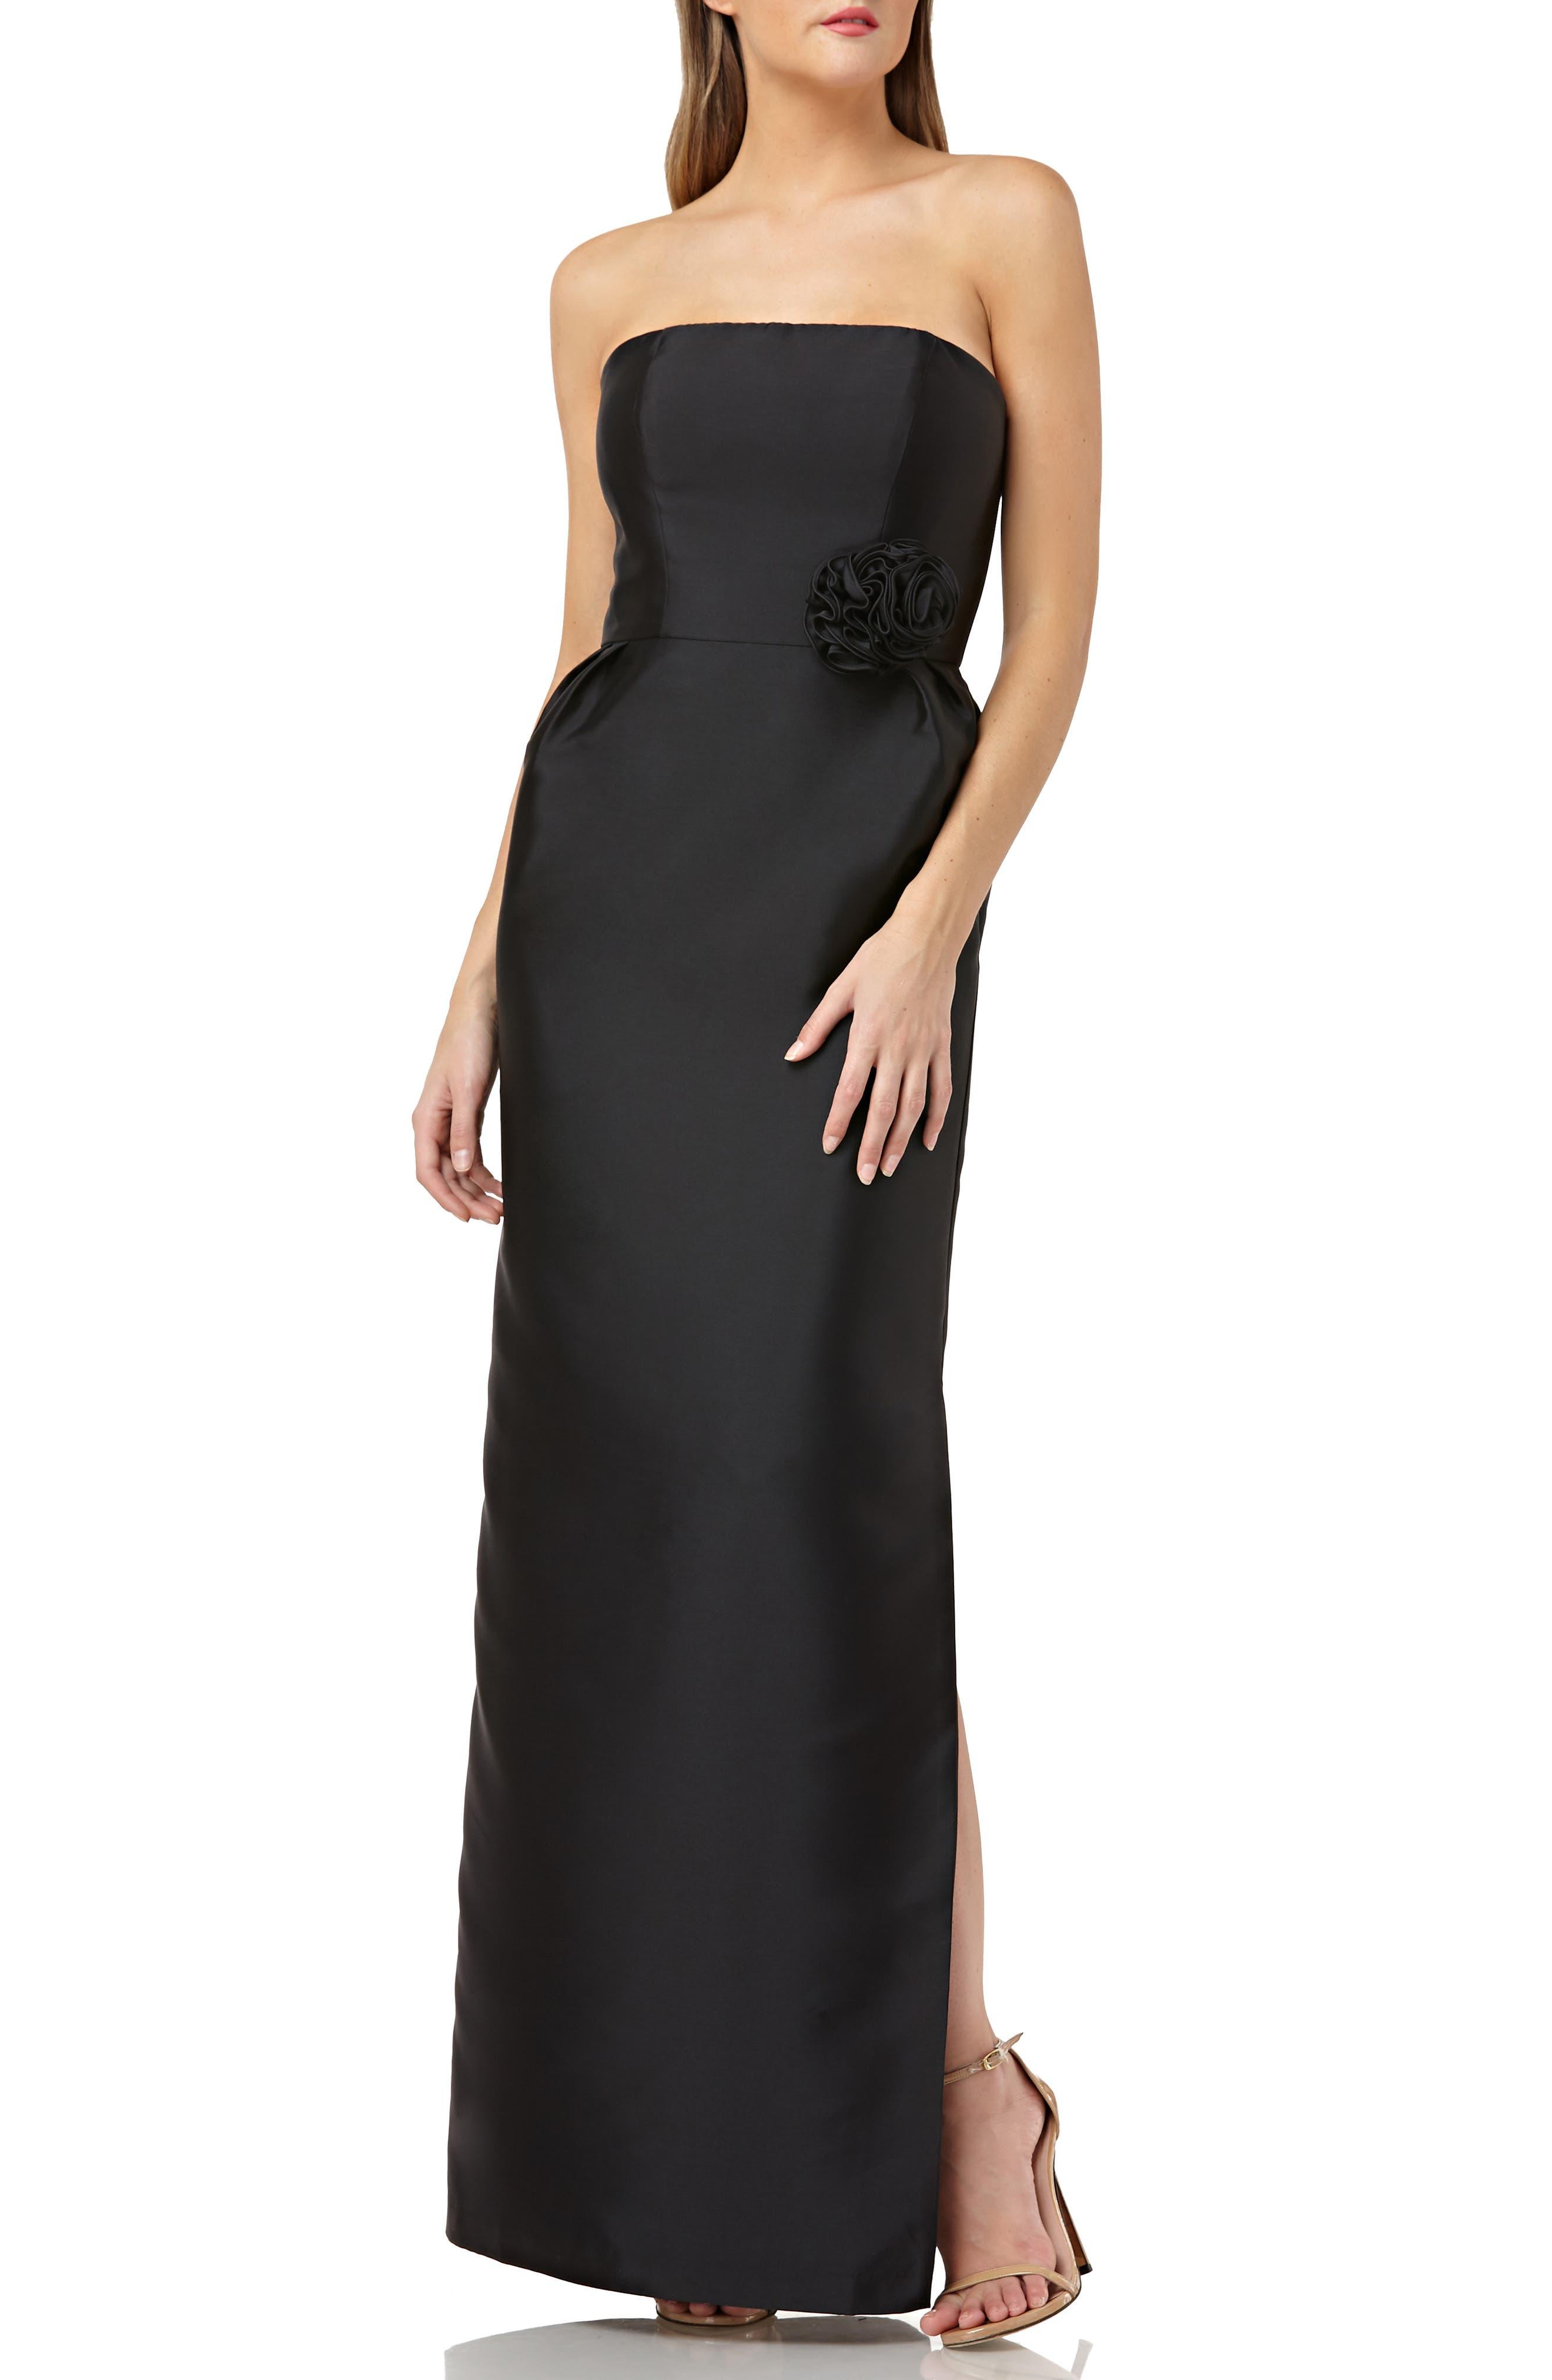 Kay Unger Strapless Mikado Evening Dress, Black